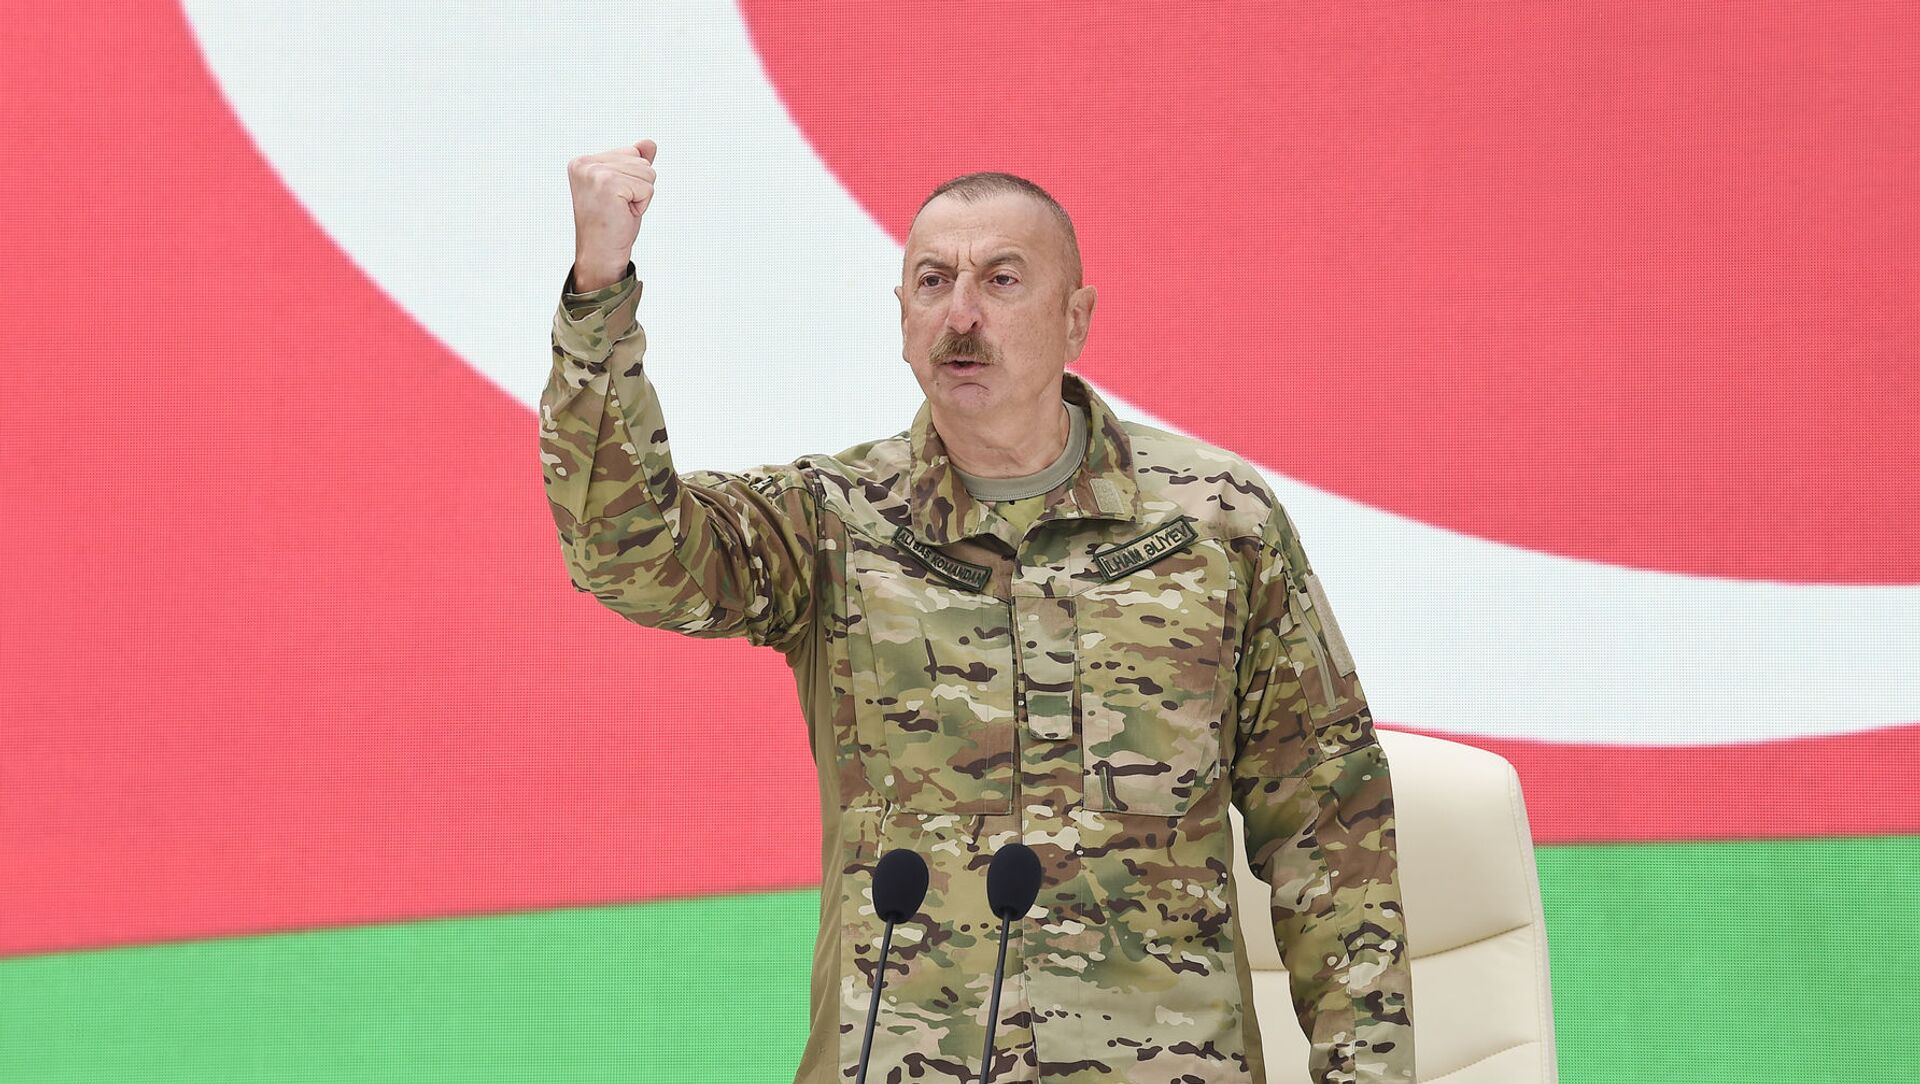 Ильхам Алиев, фото из архива - Sputnik Азербайджан, 1920, 26.09.2021